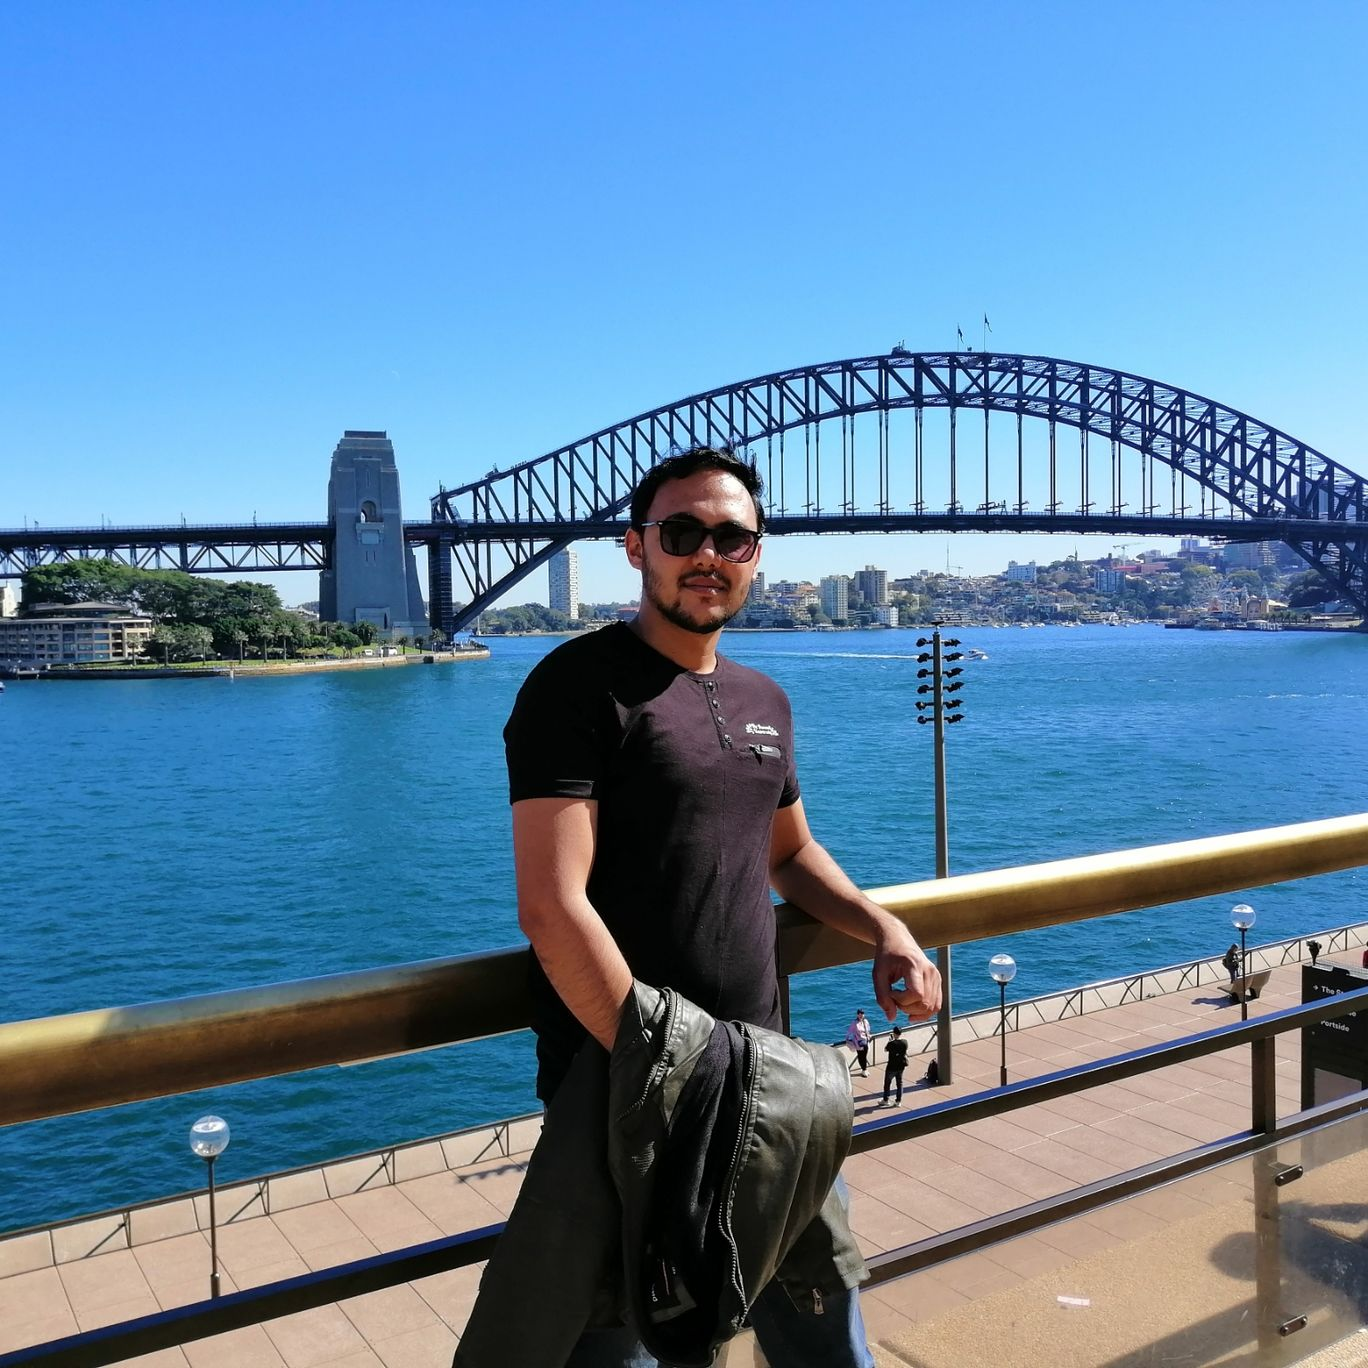 Photo of Sydney NSW By Harpreet Singh